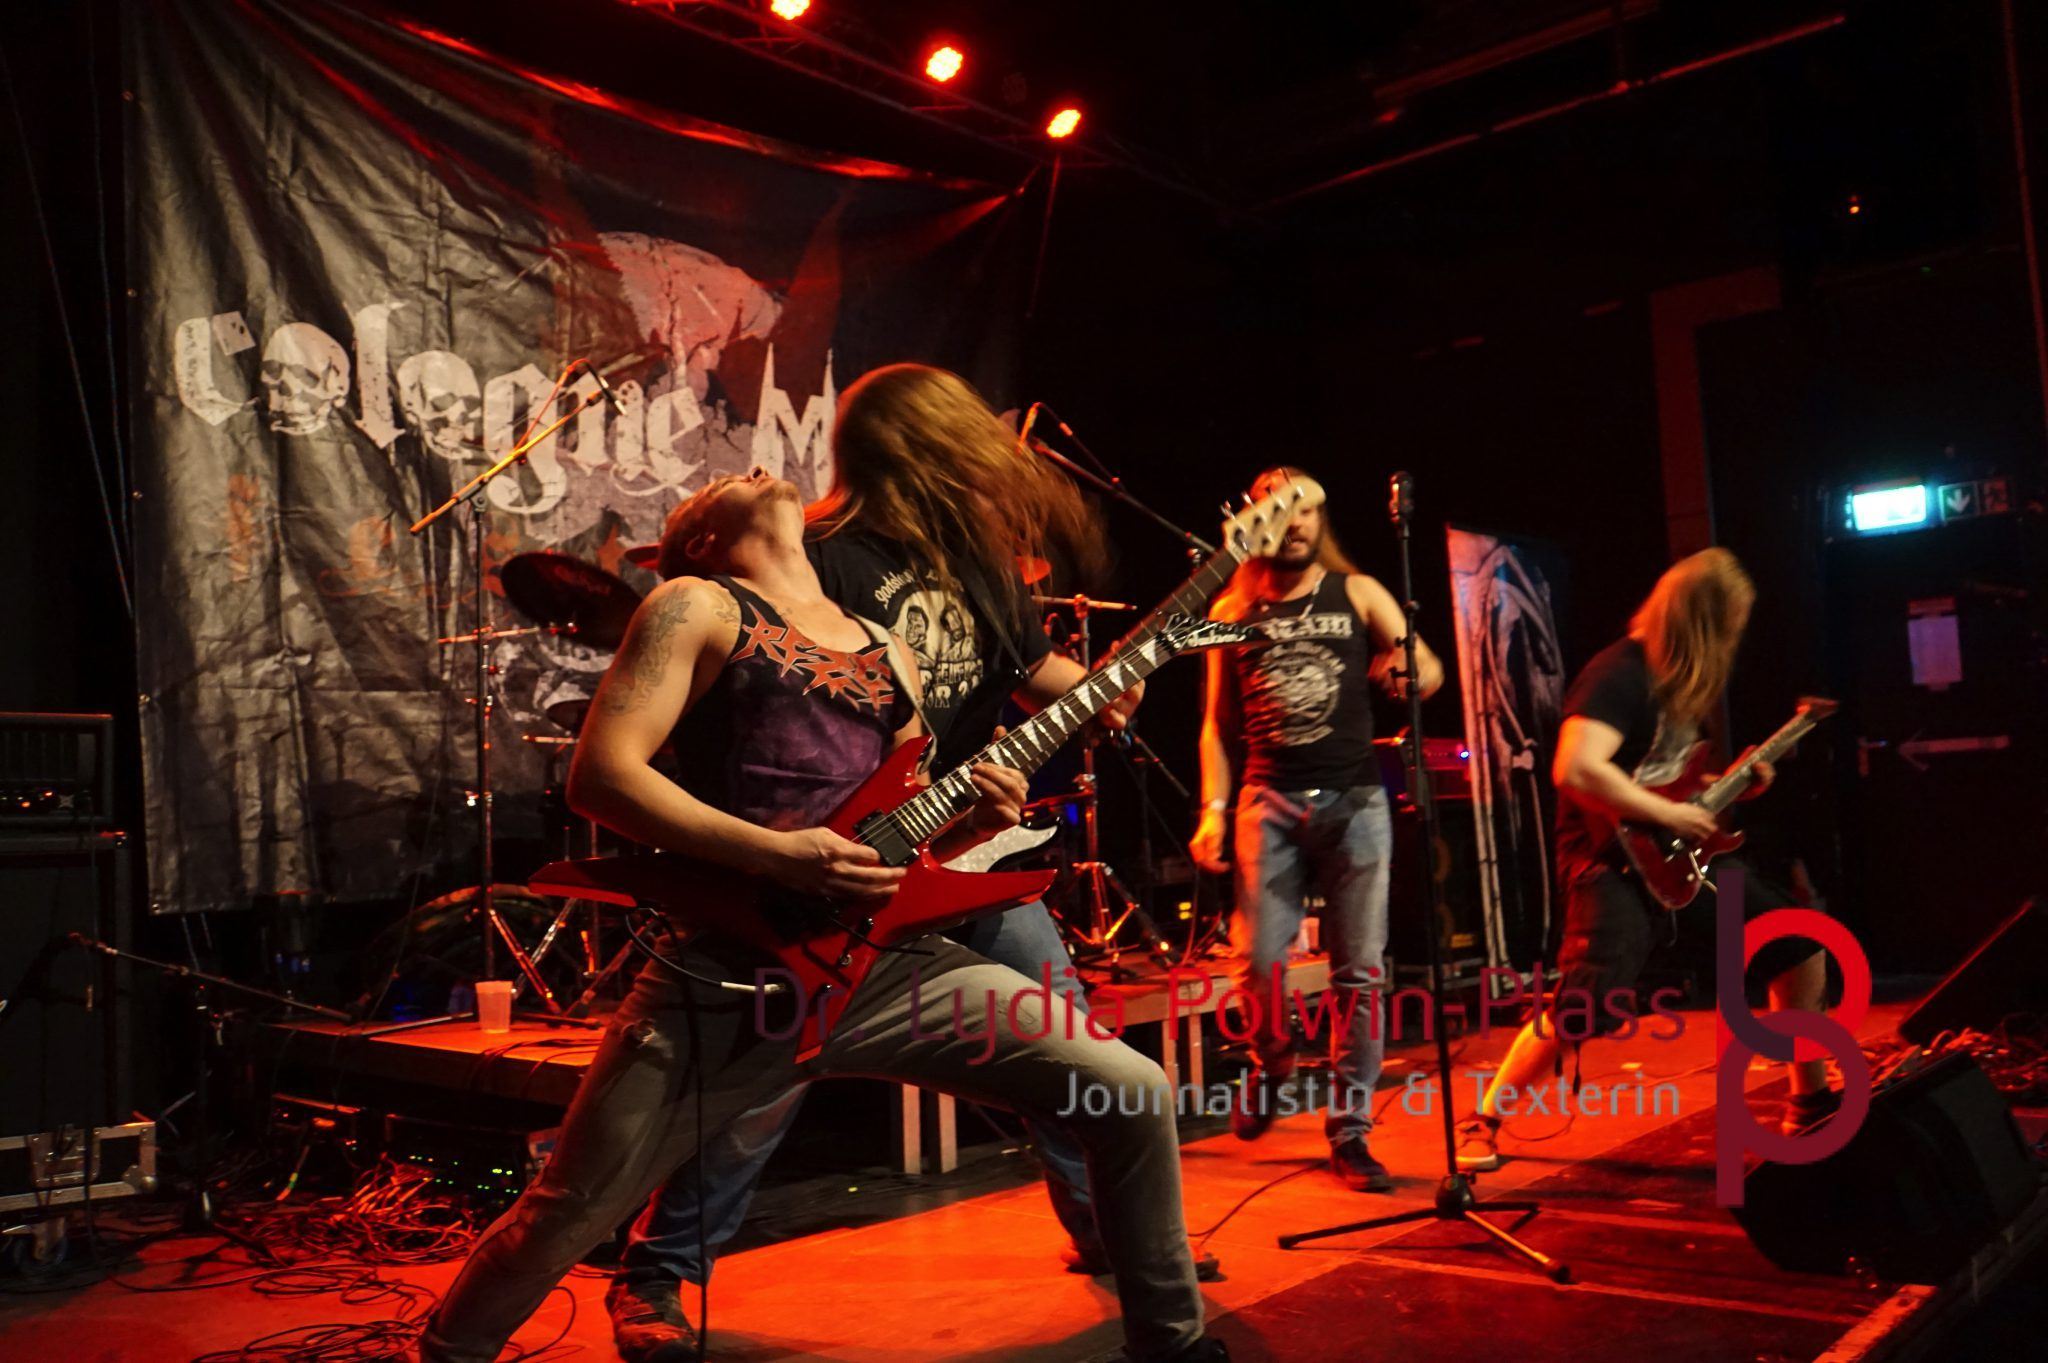 Cologne Metal Festival 2018 - Nachbericht | Metal festival